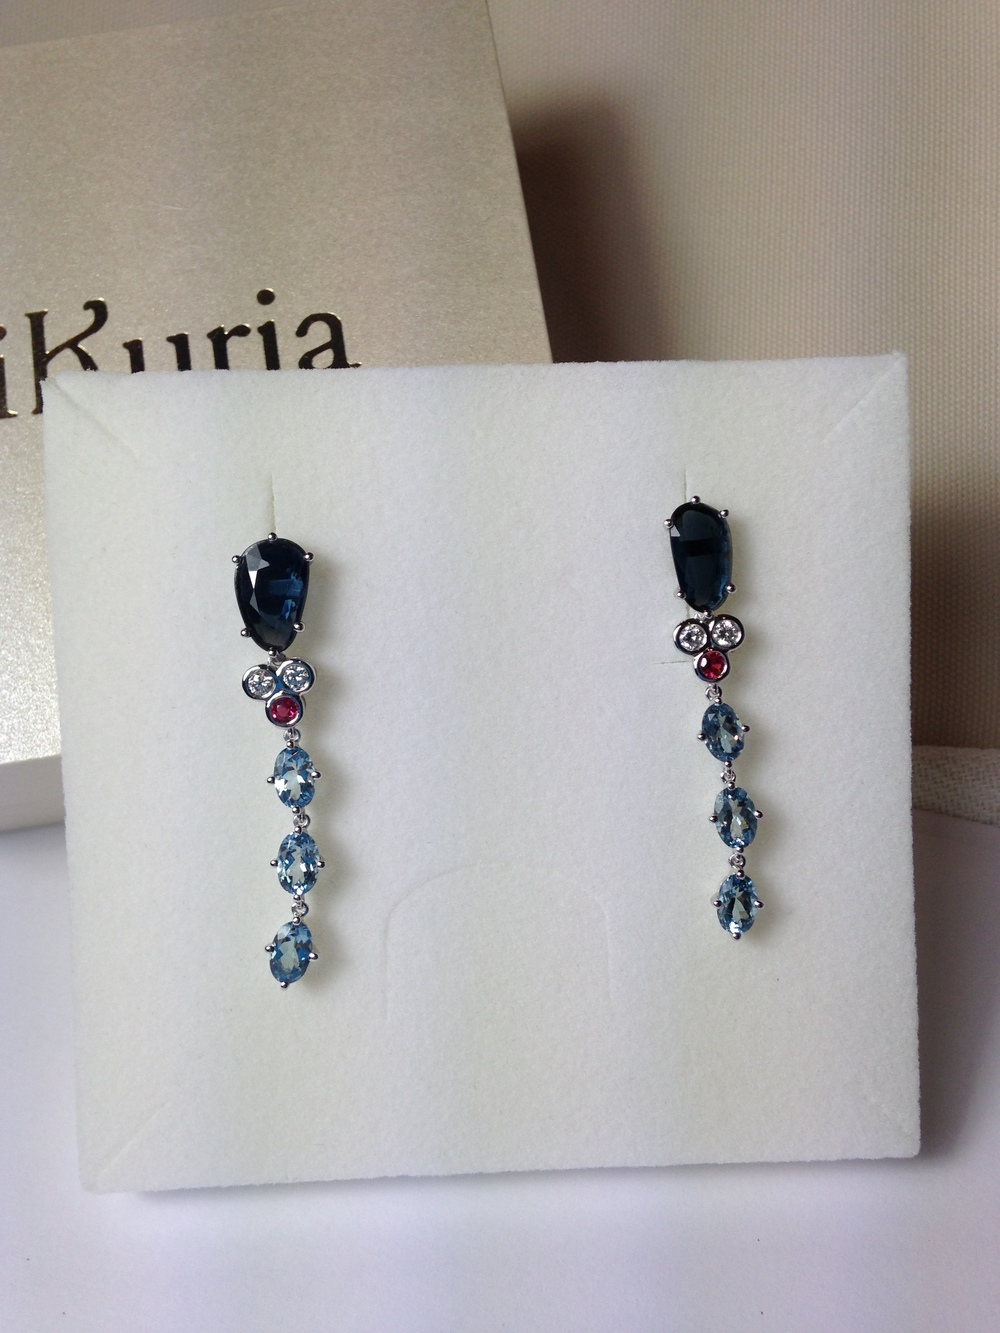 Earrings with rare blue spinel (dark blue), diamond, pink spinel and aquamarine. 18k white gold.   完成したピアス  「オアシス」。希少なブルースピネル(濃い青)、ダイヤモンド、ピンクスピネル、アクアマリン。地金は 18 金ホワイトゴールド。